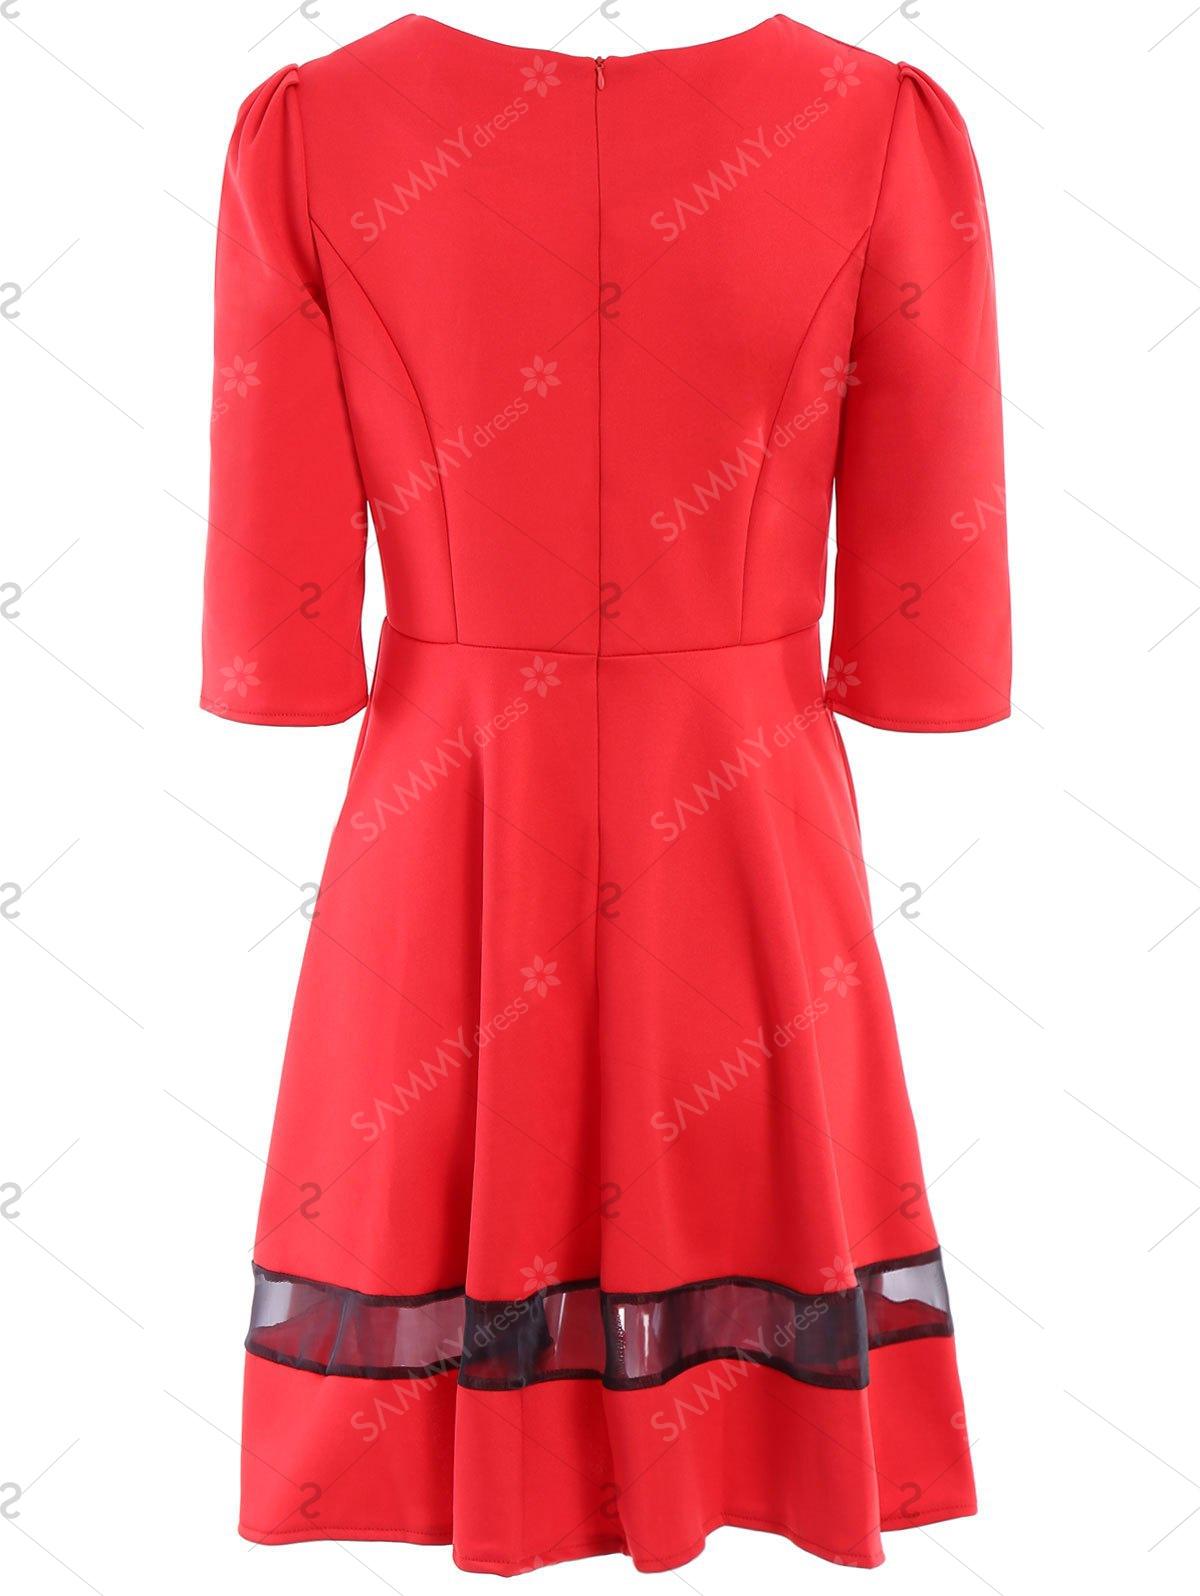 1200x1596 Stylish Round Collar 34 Sleeve Spliced Dress For Women